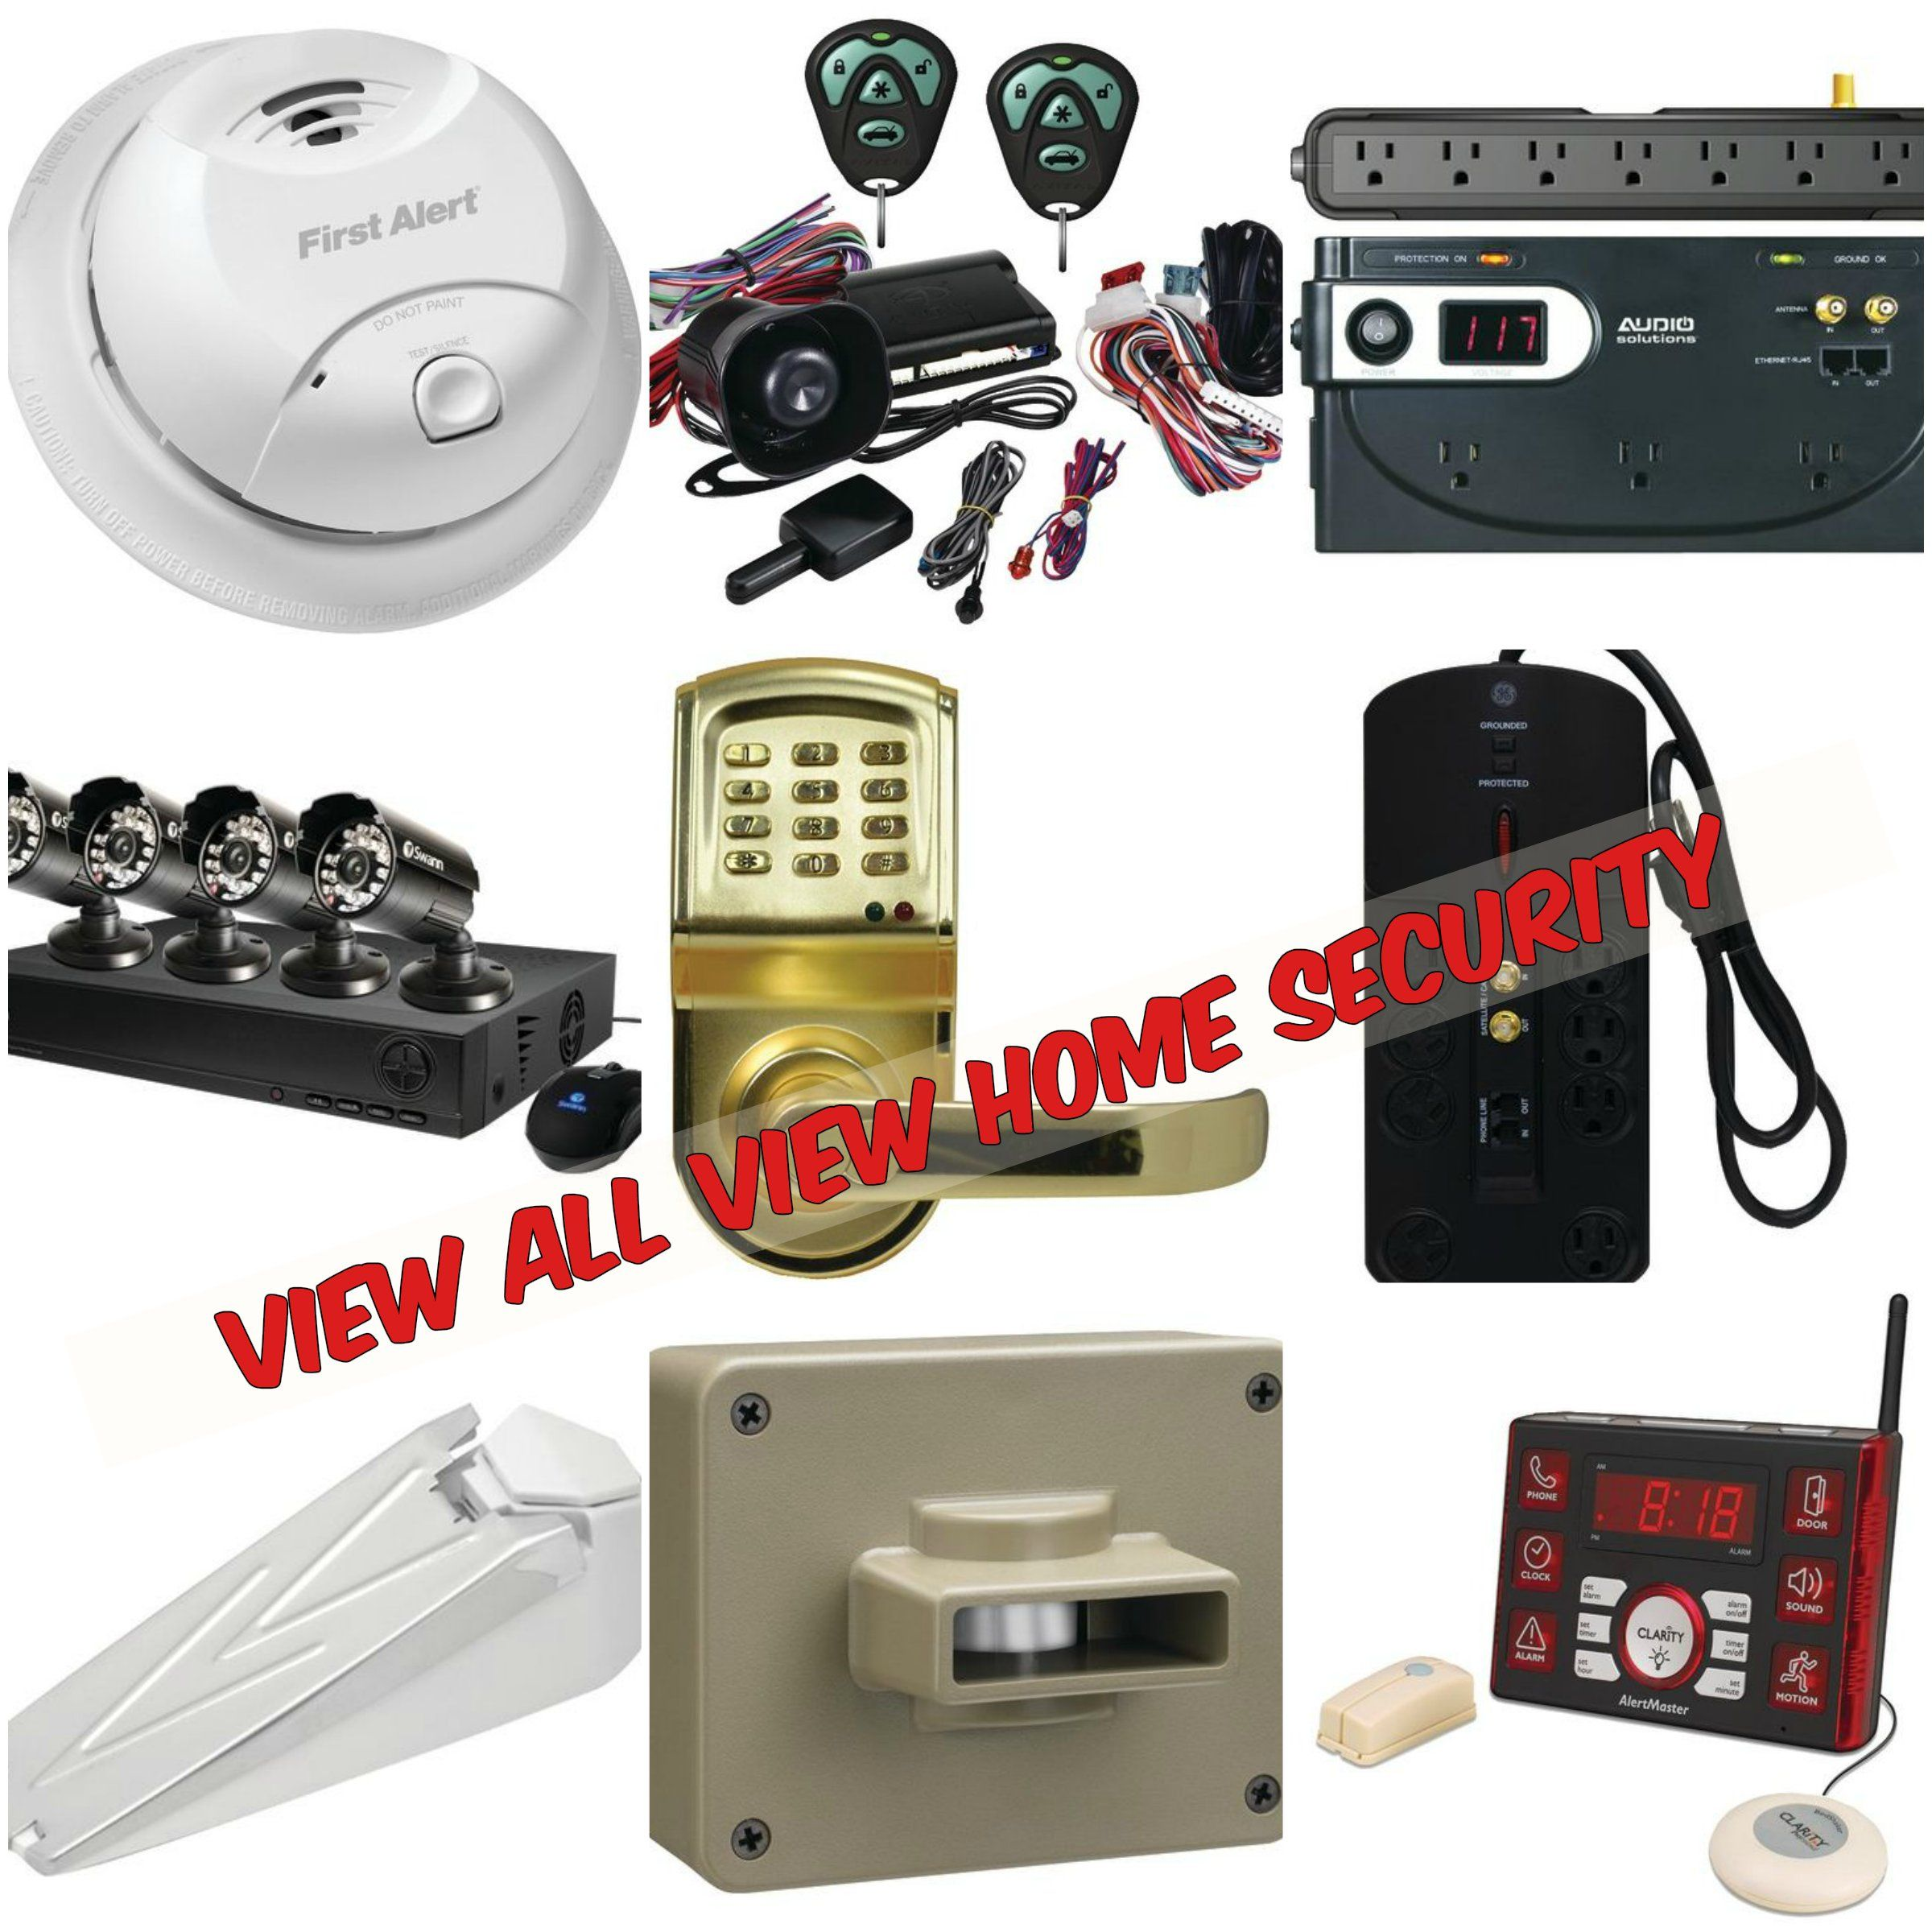 Security Cameras, Spy Cameras, Outdoor Security Cameras, Home ...